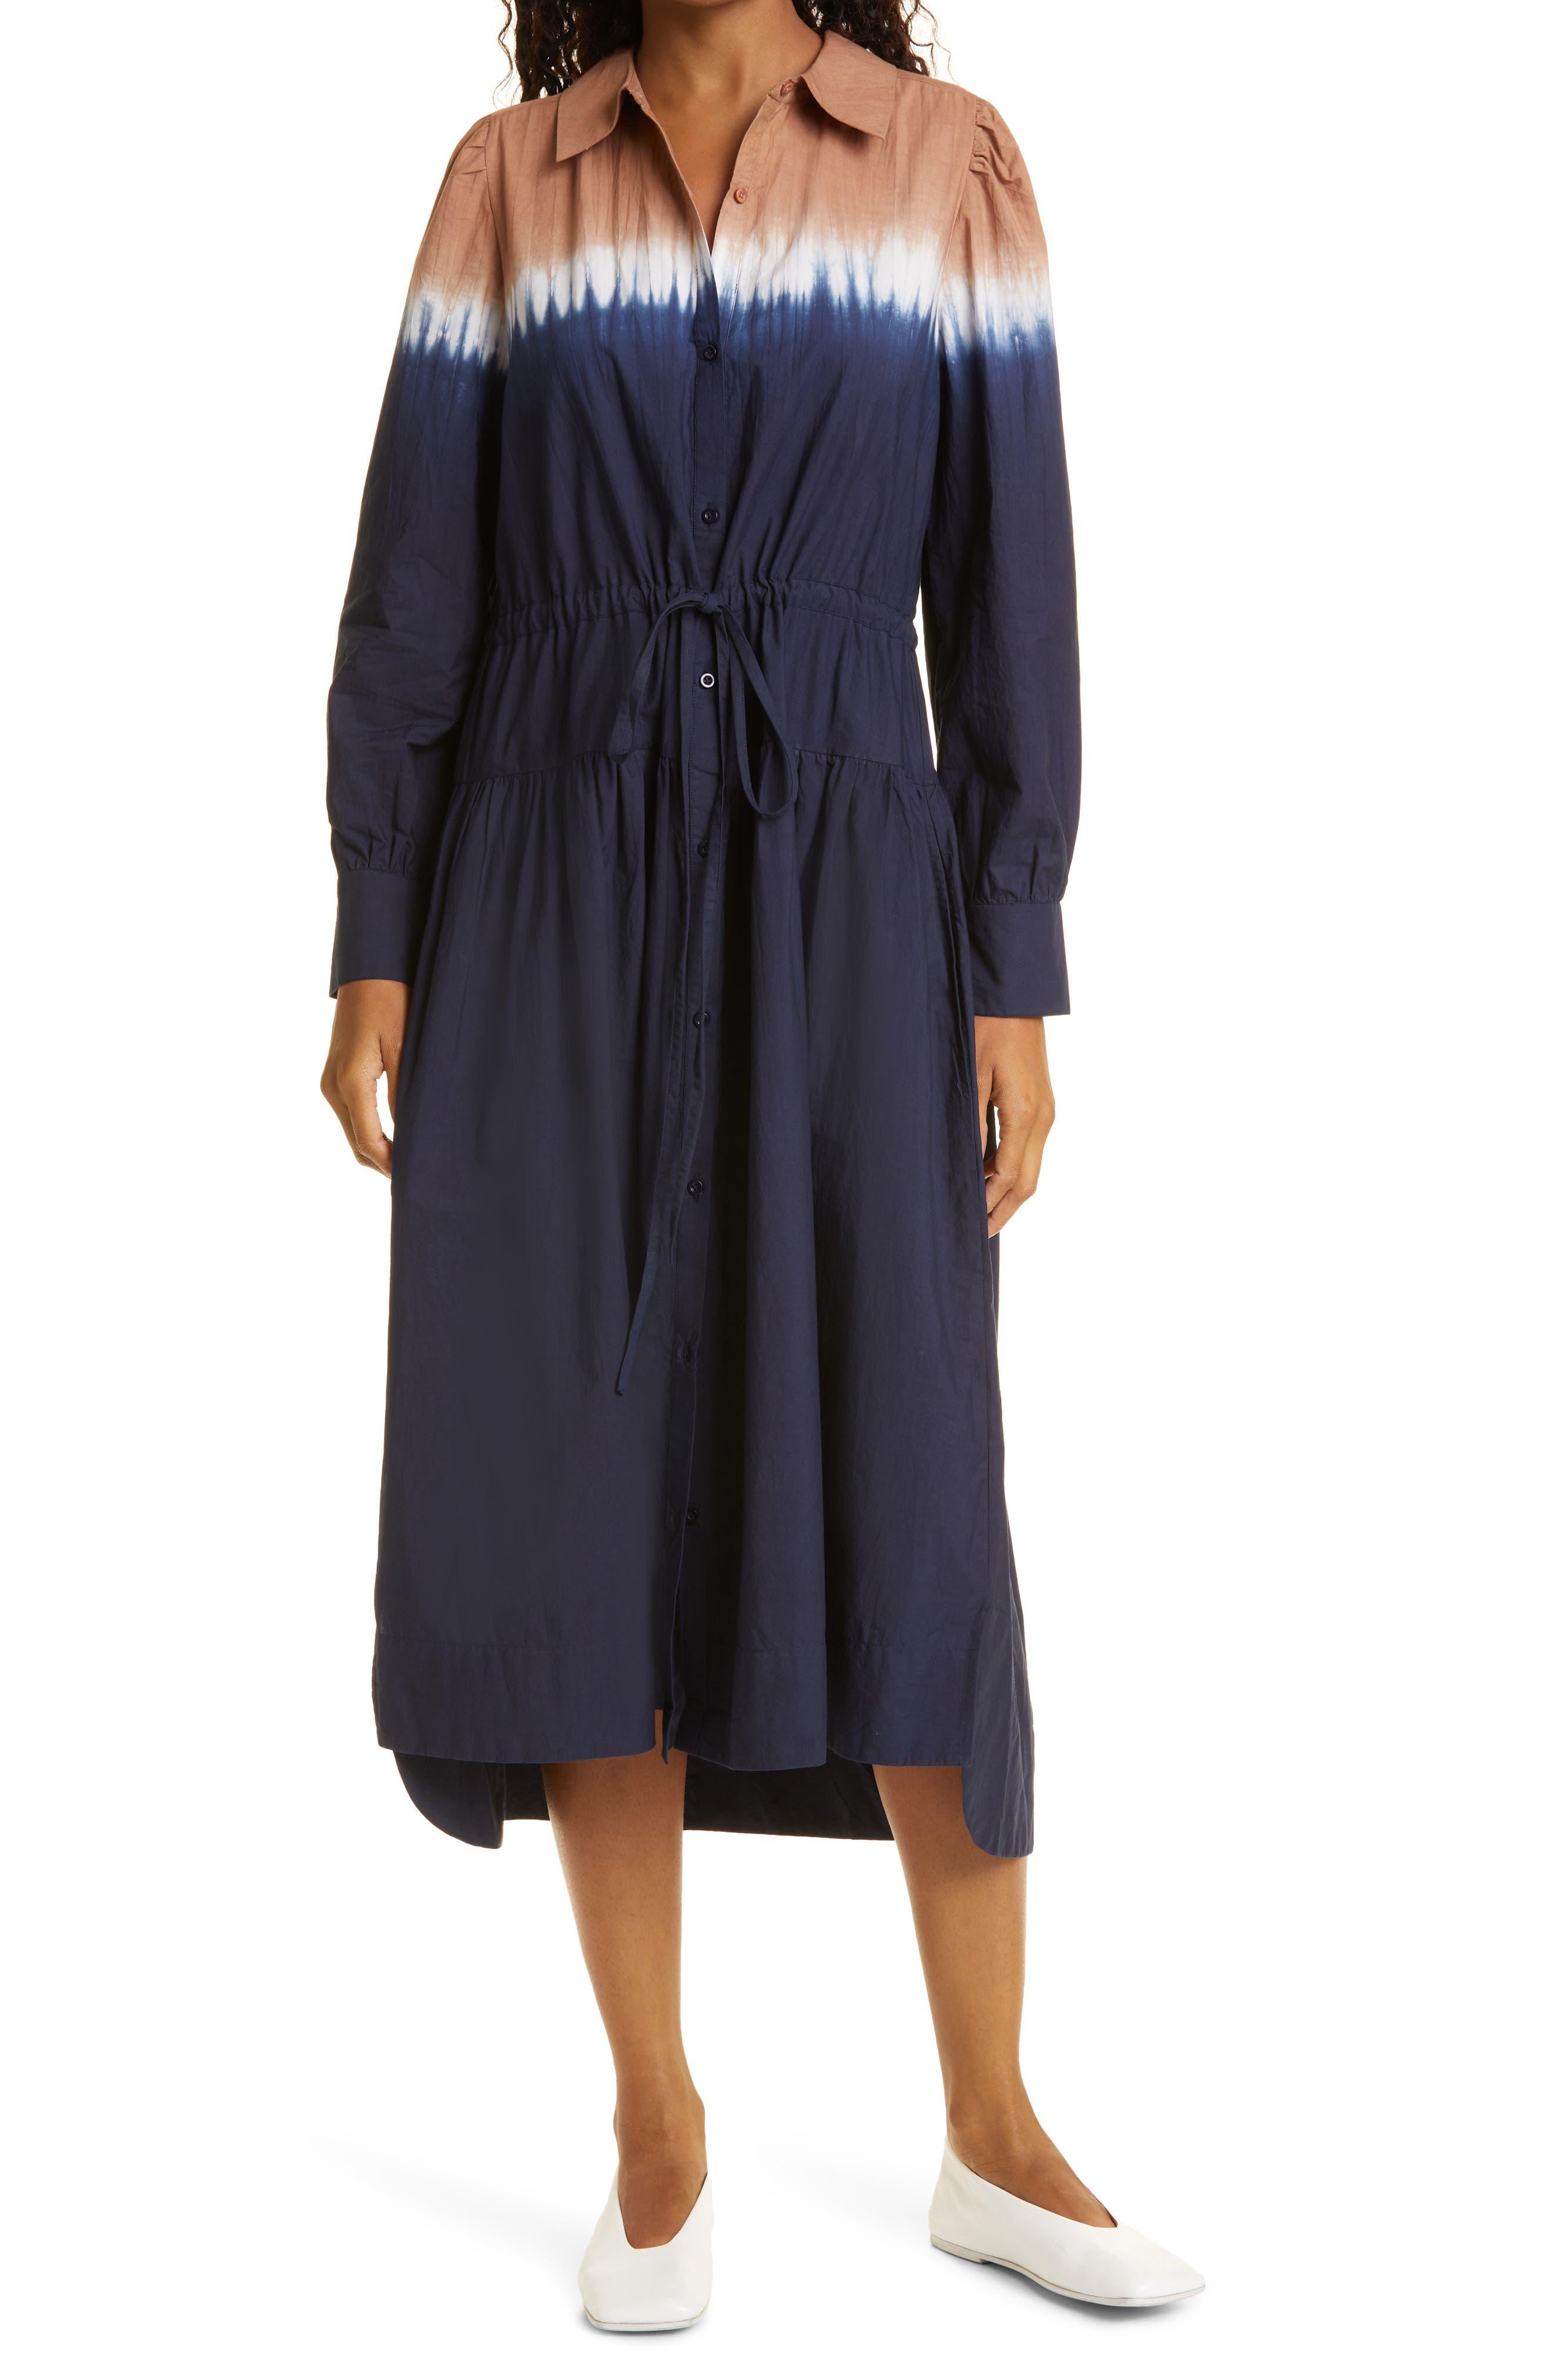 Women's Zabeta Dip Dye Long Sleeve Organic Cotton Shirtdress